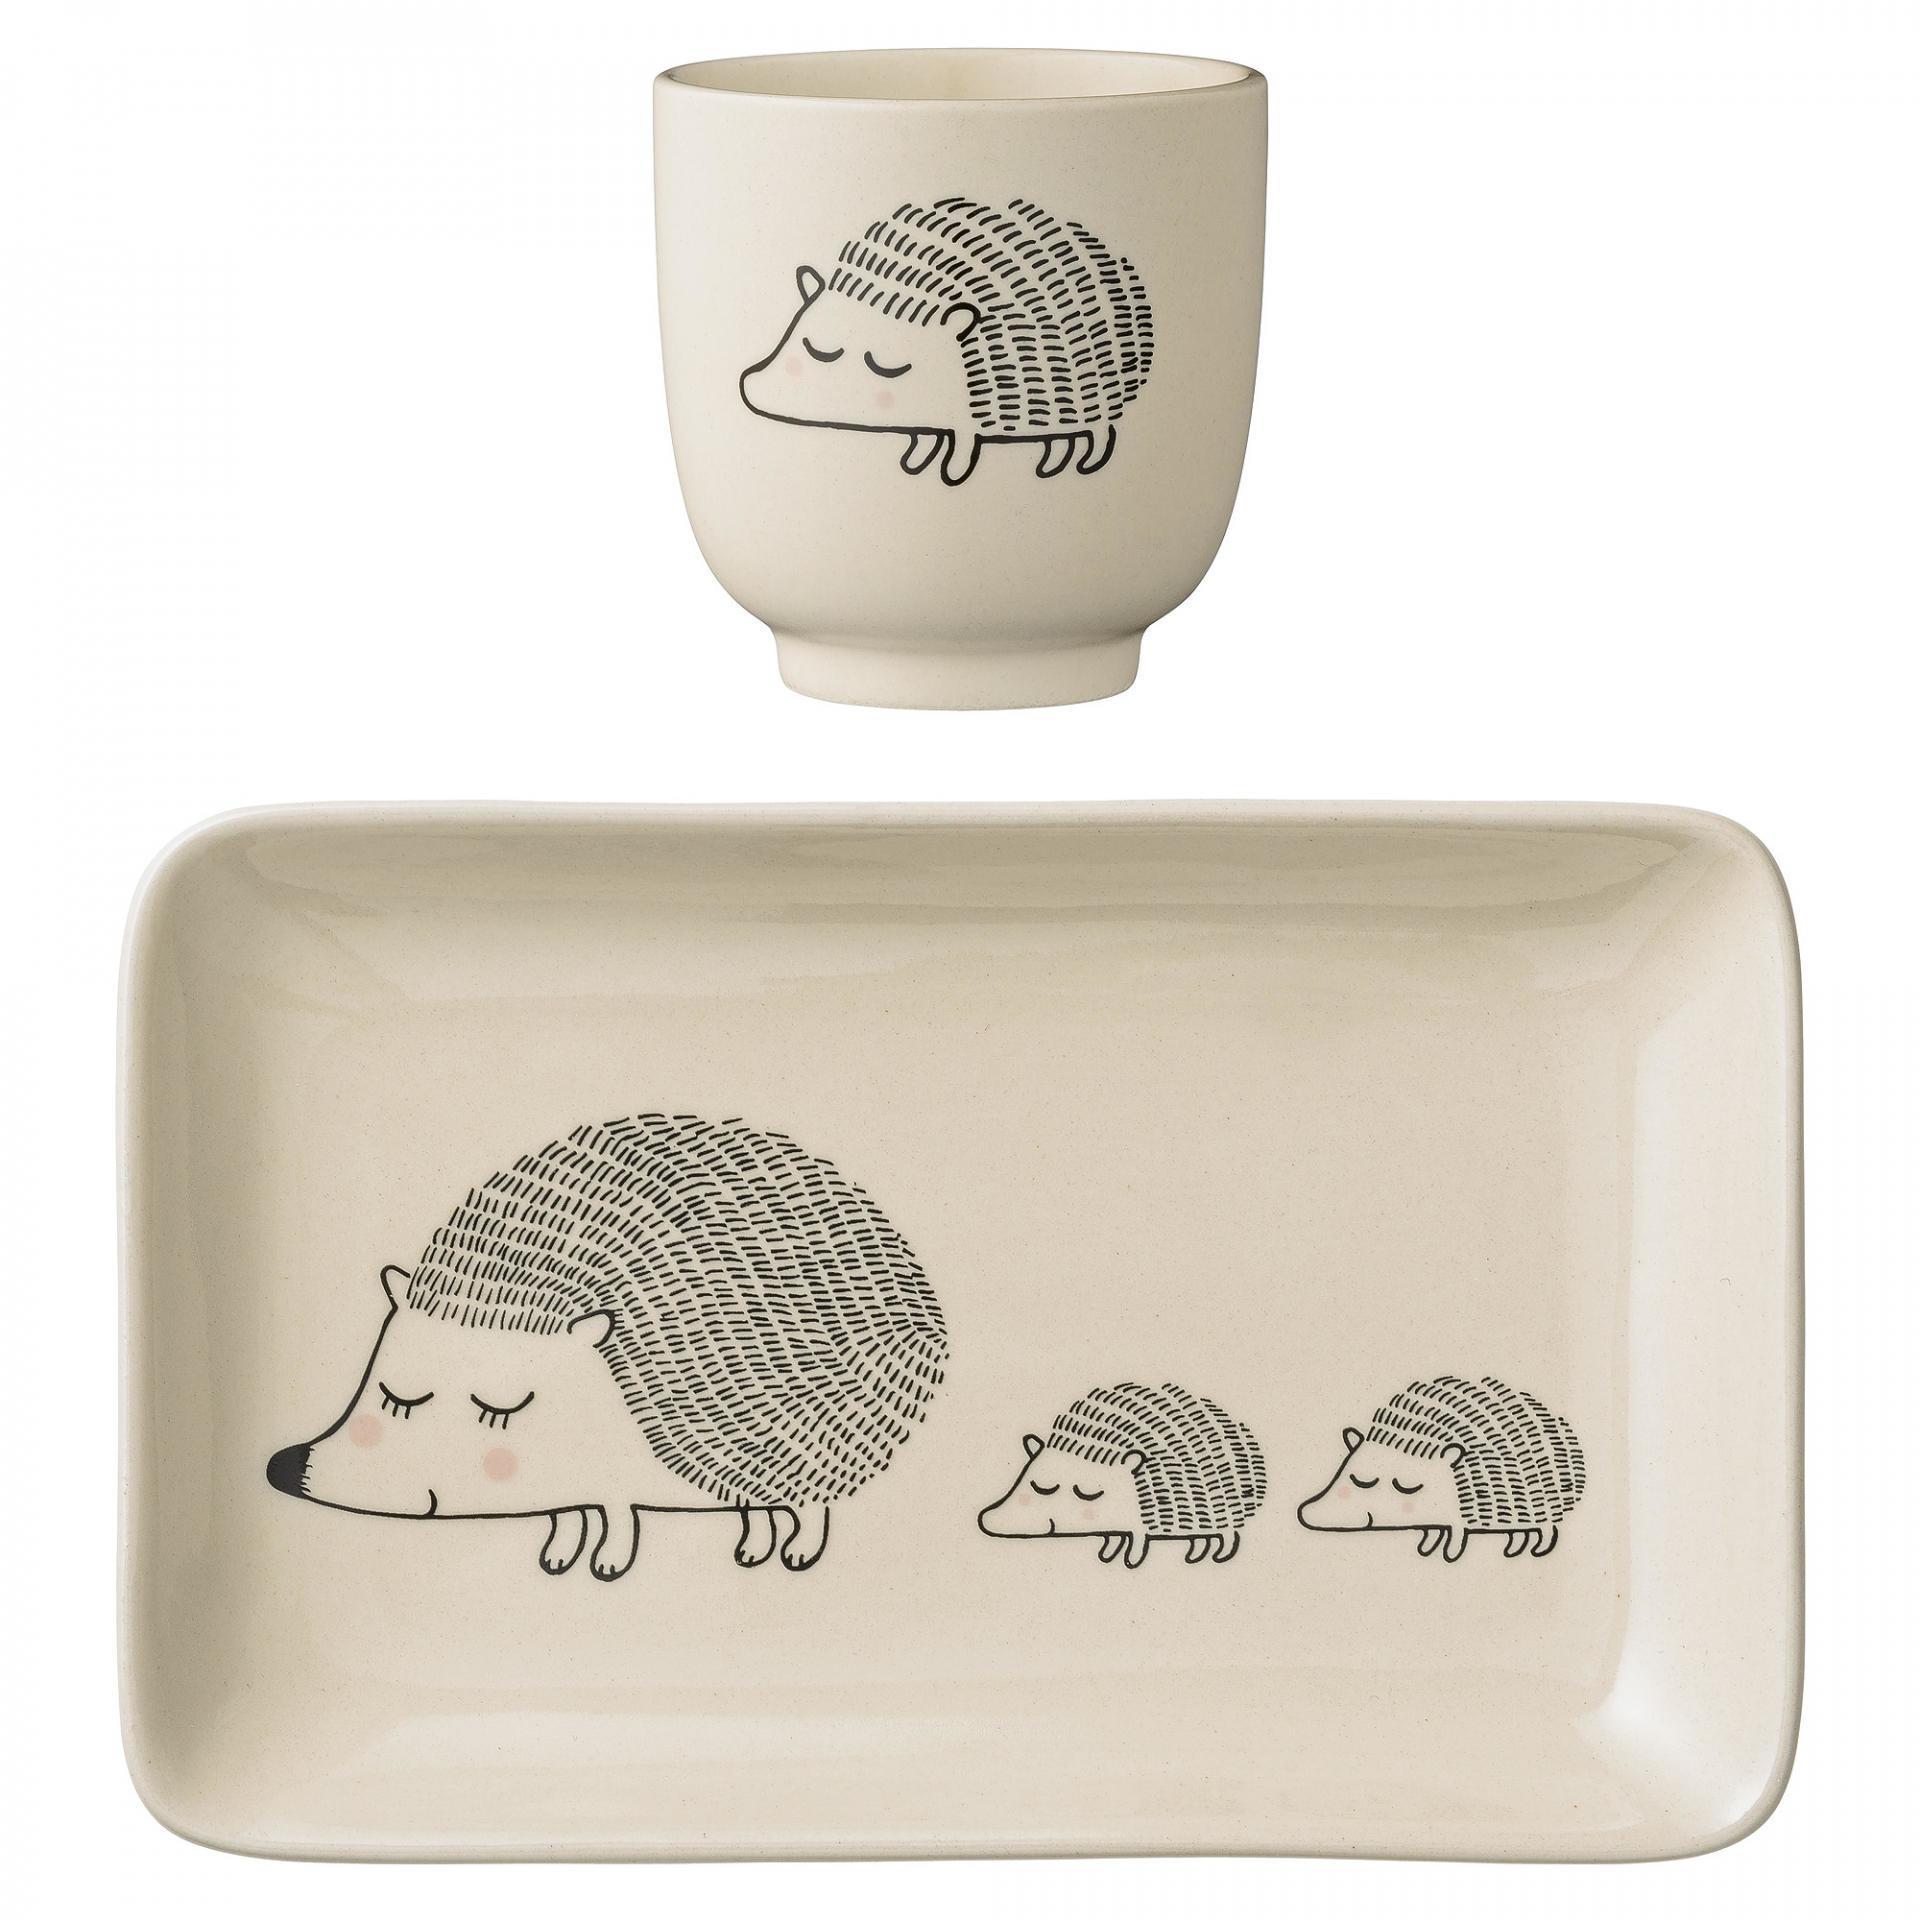 Bloomingville Tácek s kalíškem pro děti Hedgehog - set 2 ks, béžová barva, keramika